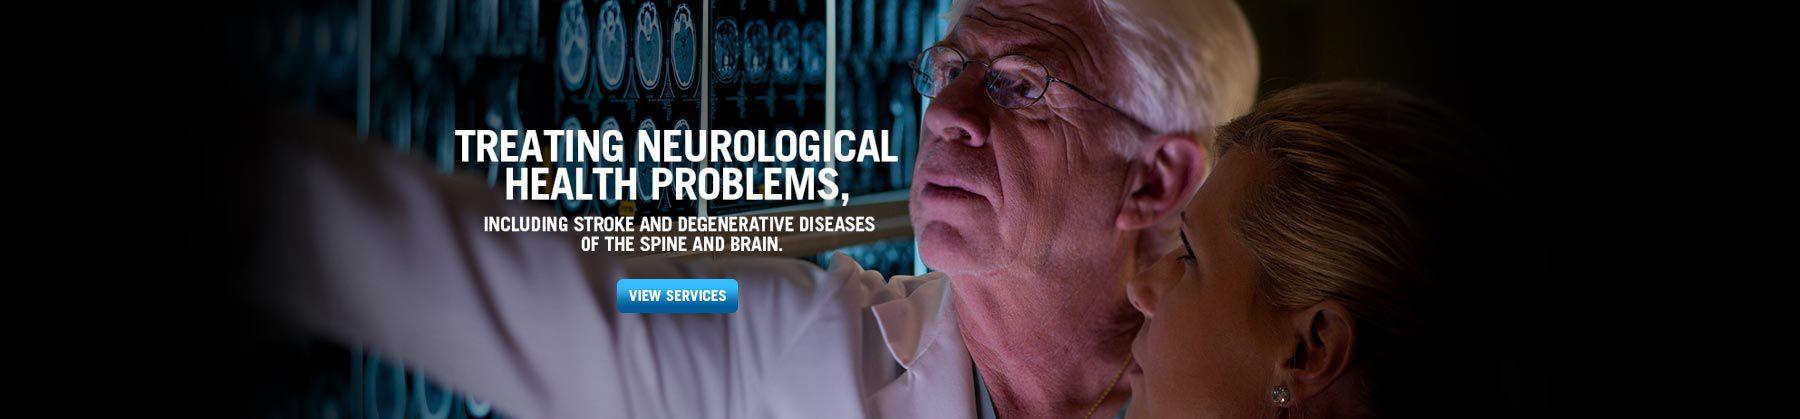 Treating Neurological Health Problems